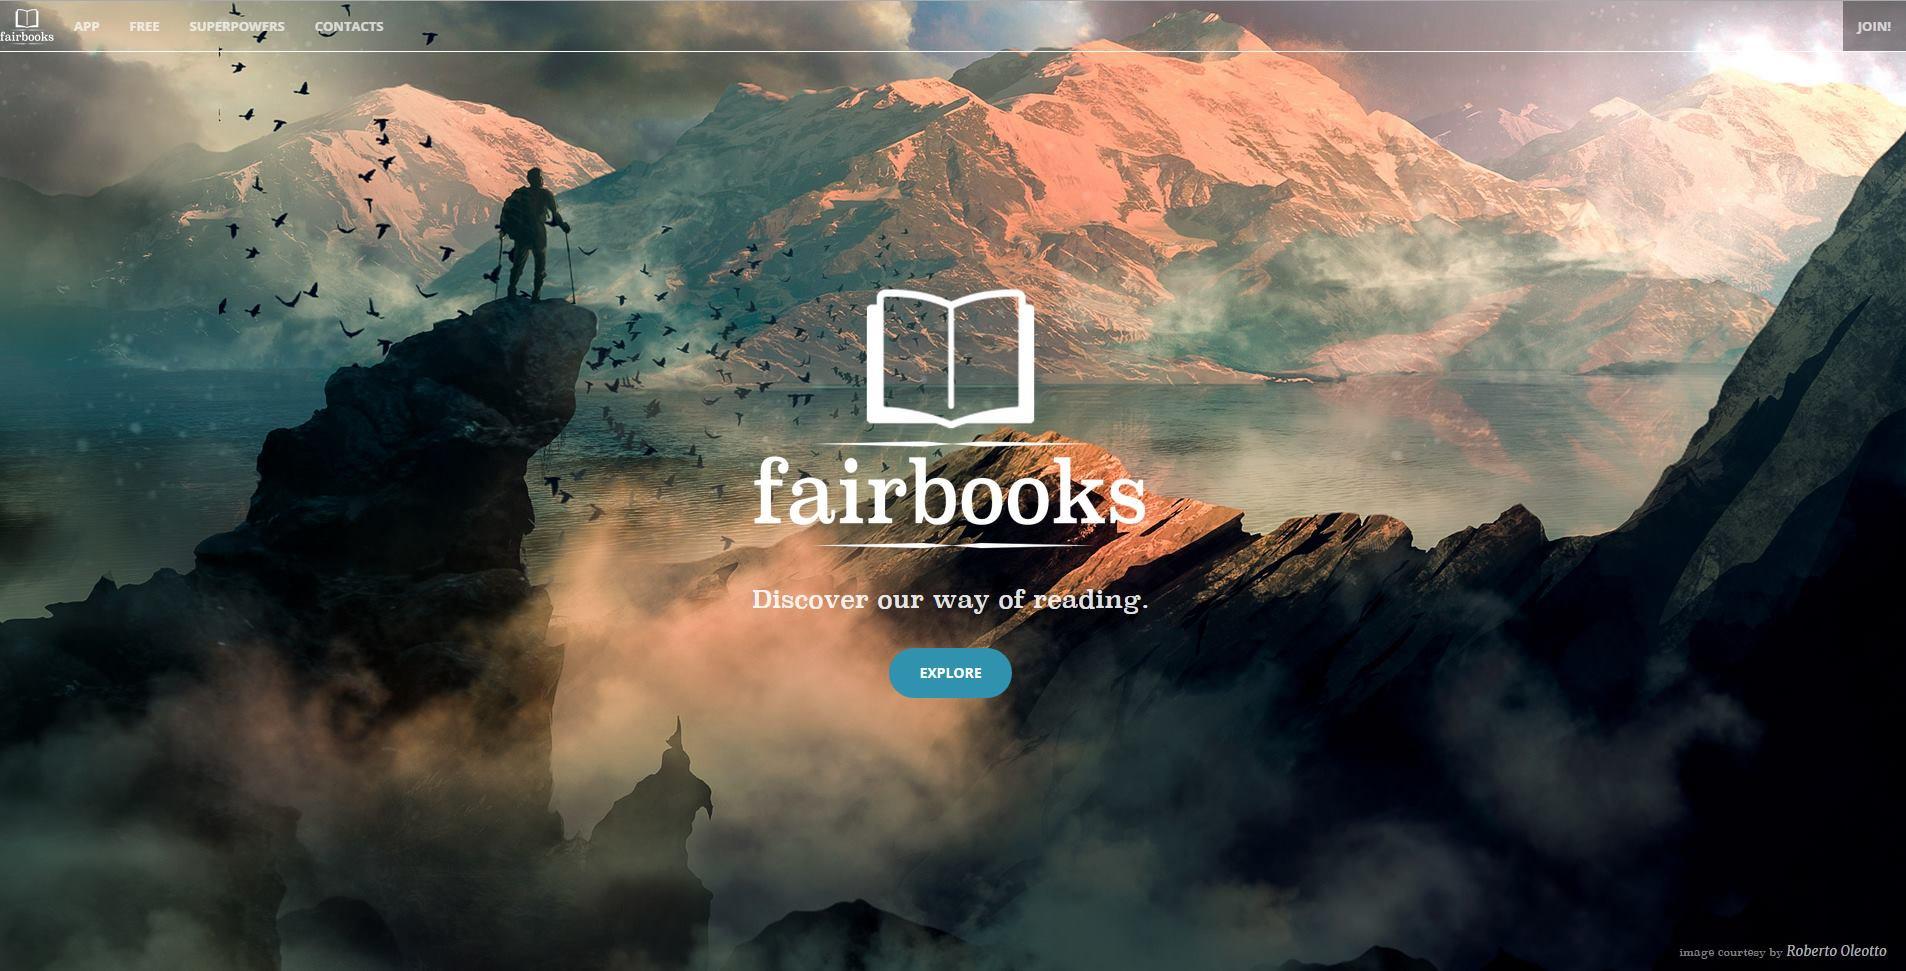 Fairbooks